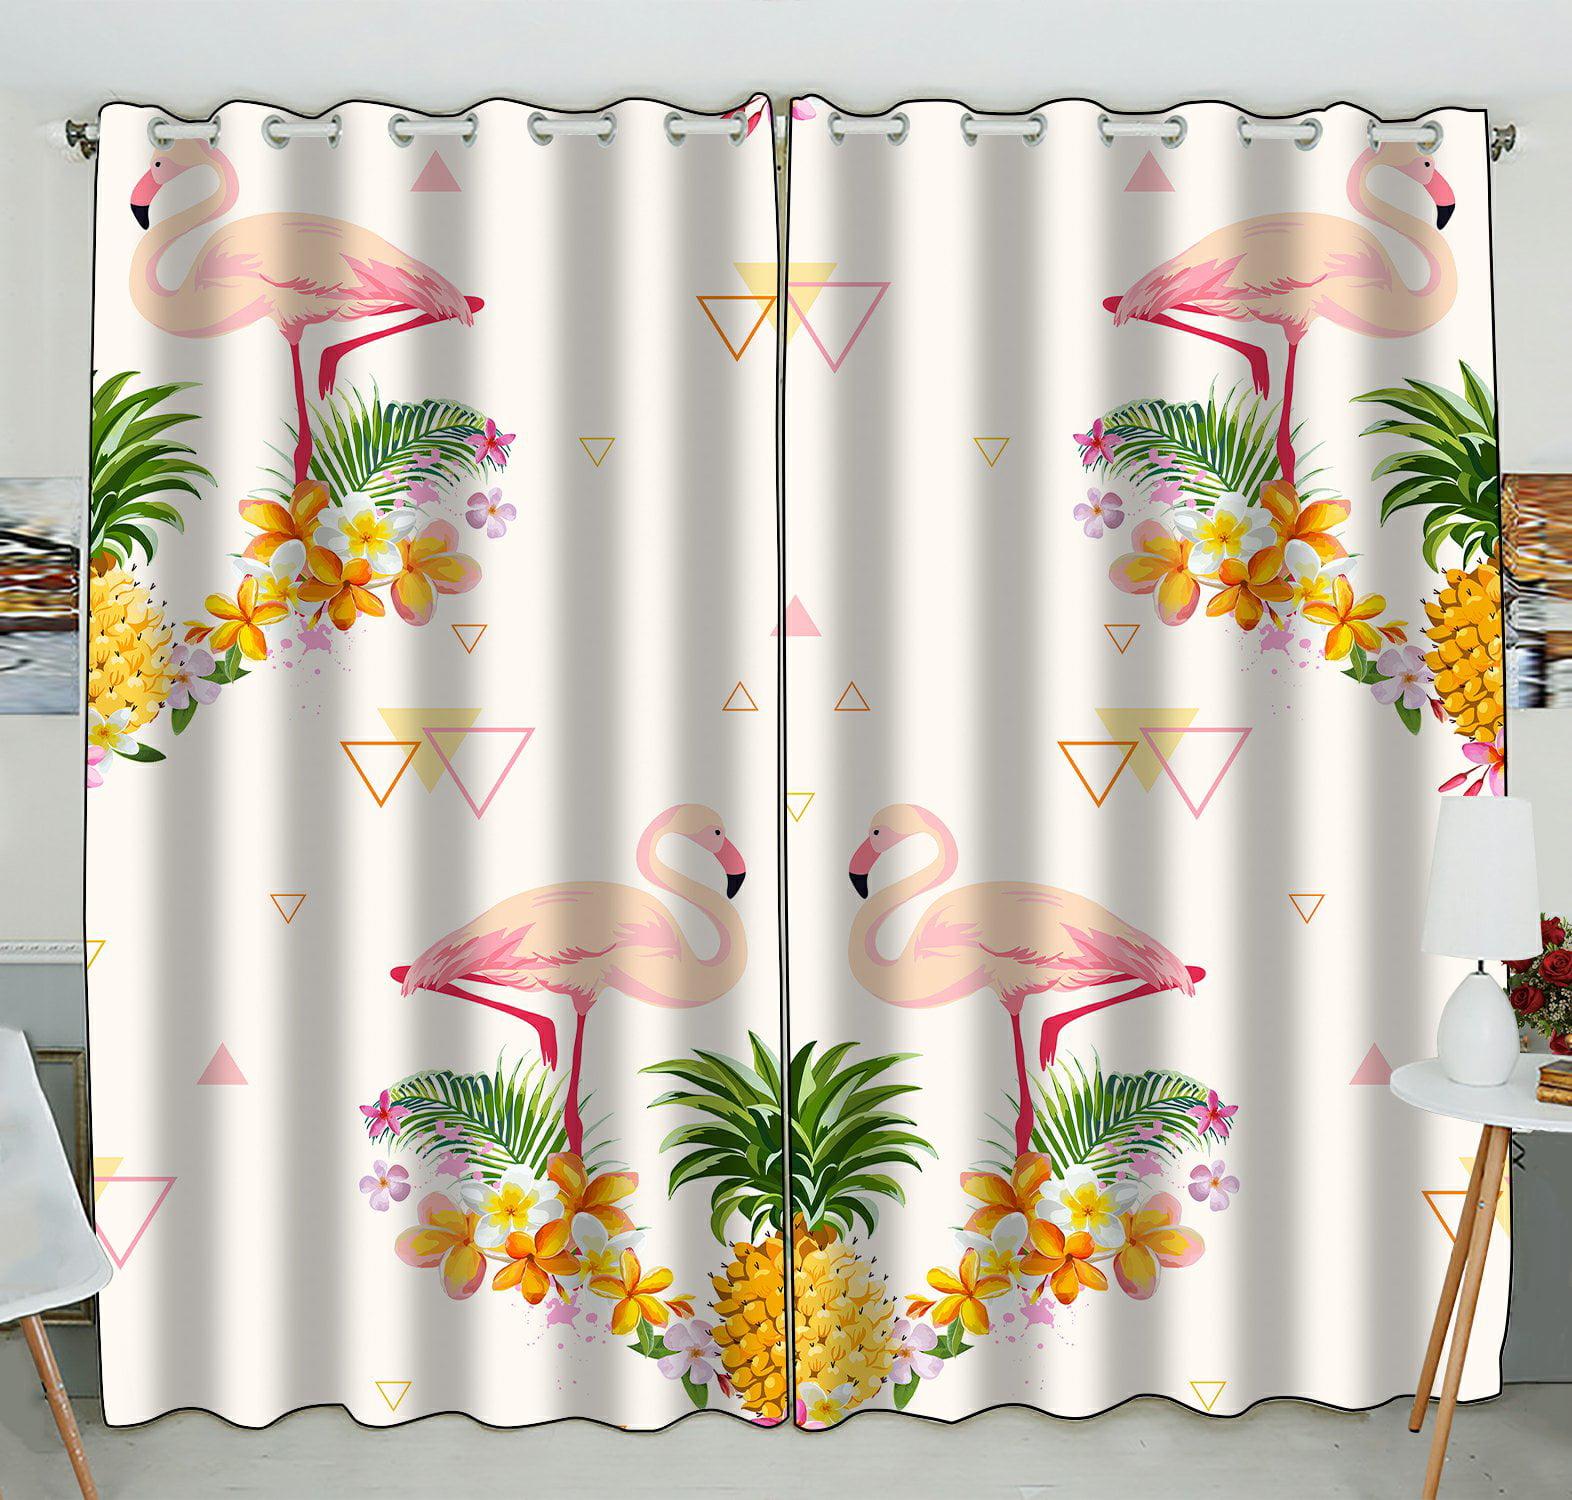 PHFZK Geometric Window Curtain, Pink Flamingo And